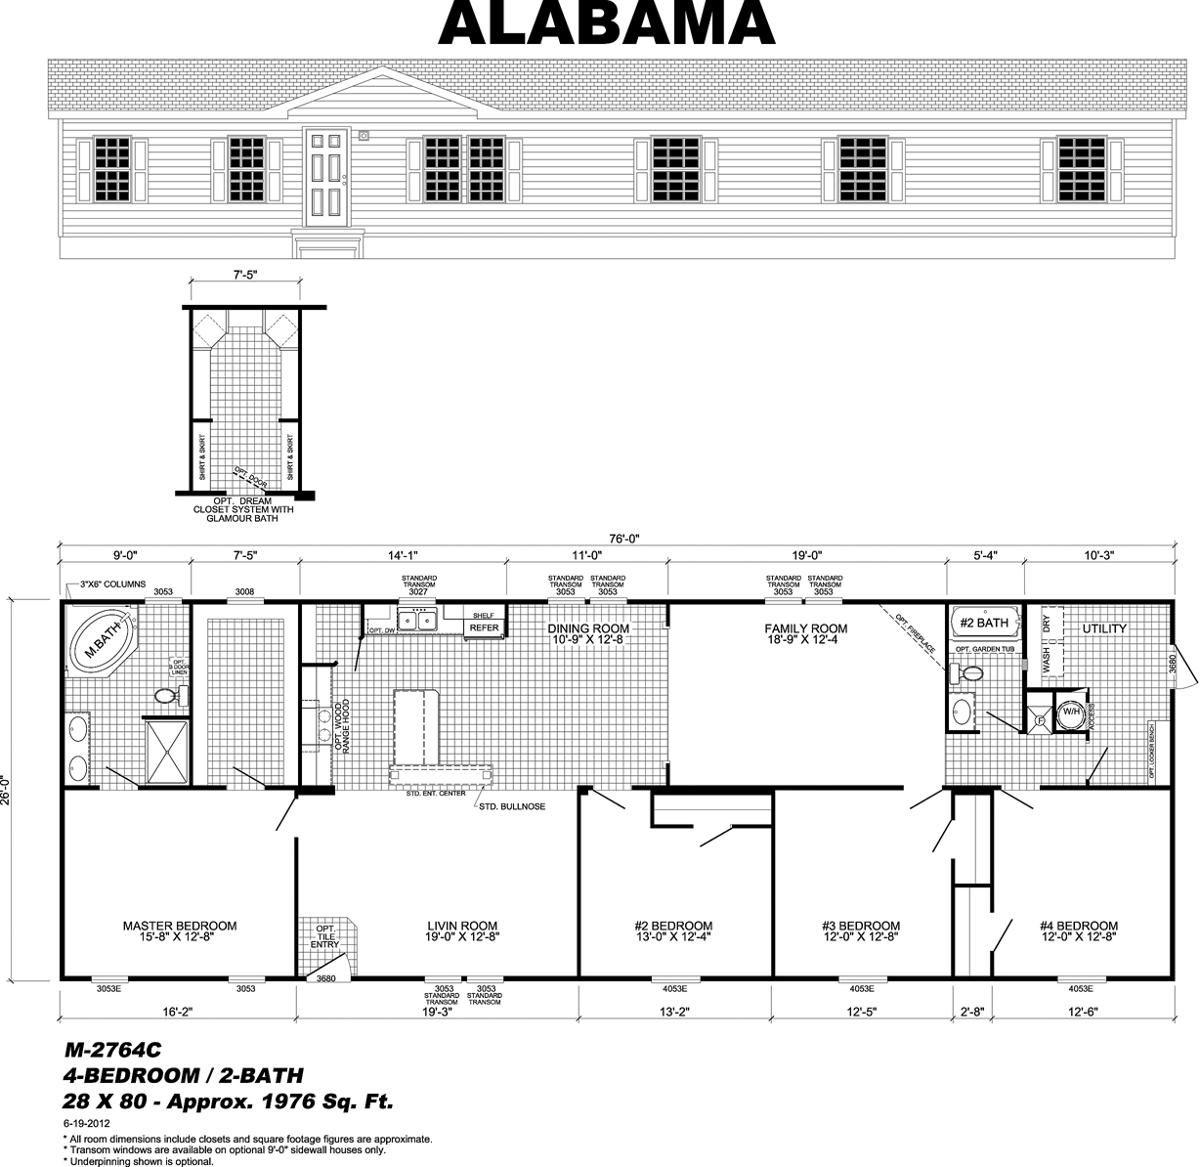 Mossy Oak Rainbow Homes Augusta, GA Mobile home